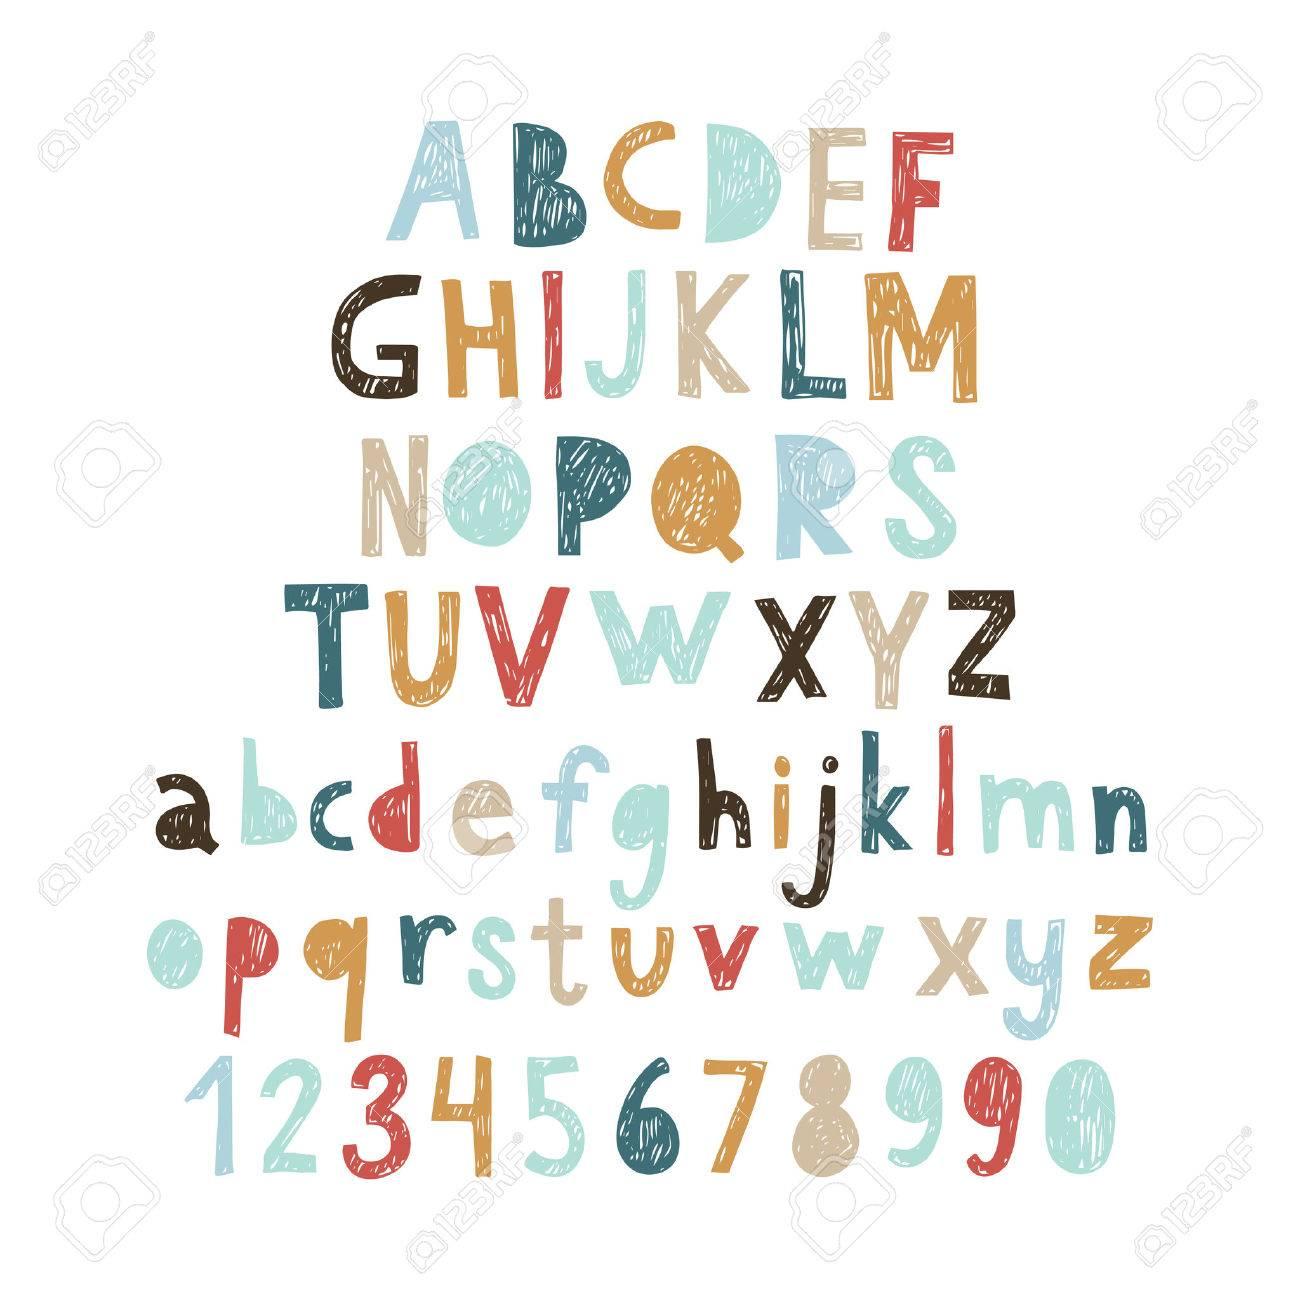 Hand drawn doodle abc, cut out font. Vector illustration. - 53038980